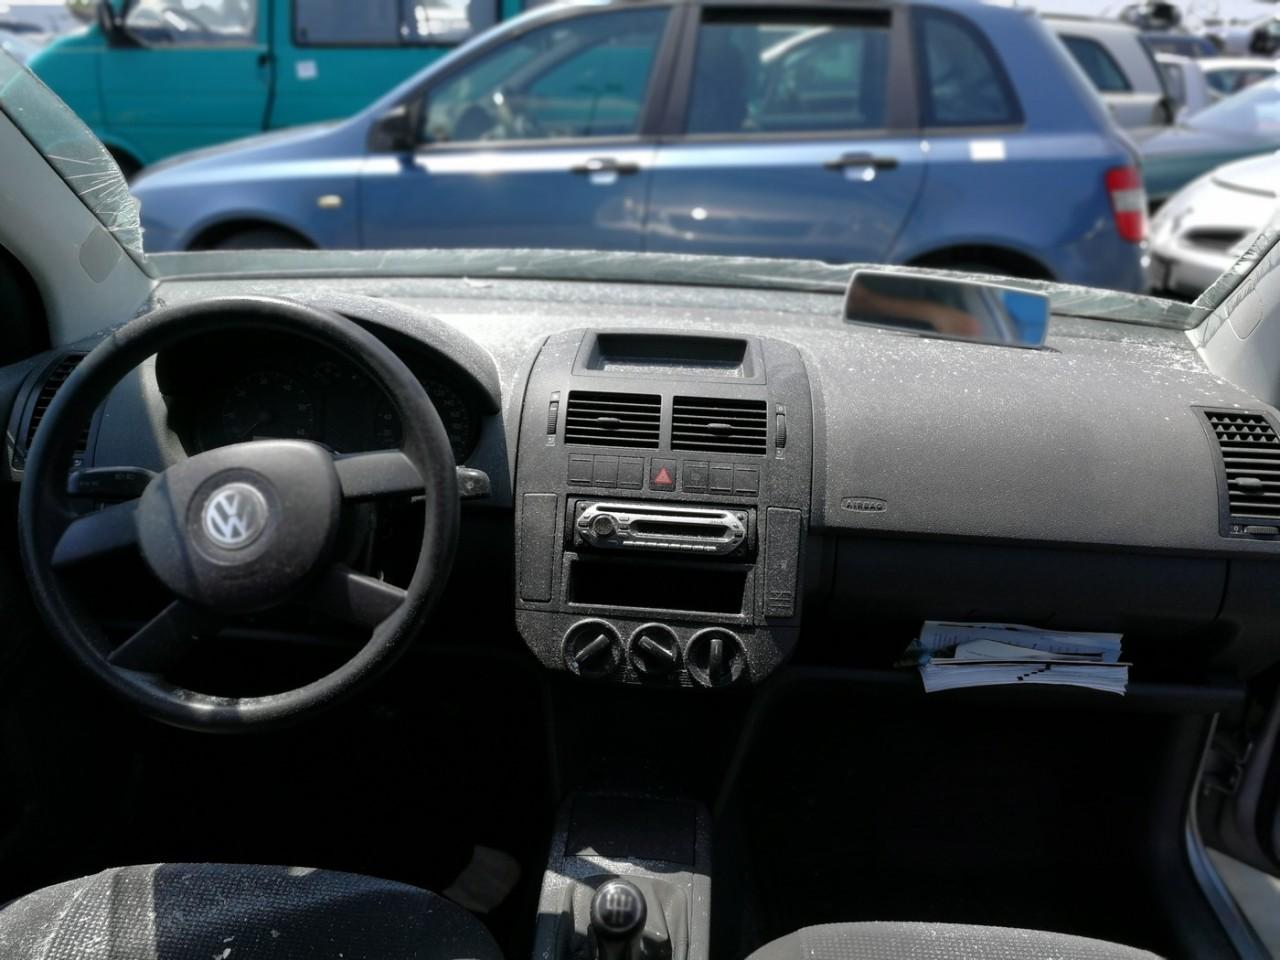 DEZMEMBREZ Volkswagen Polo 9N 1.2 6v tip AWY tip cutie GSH